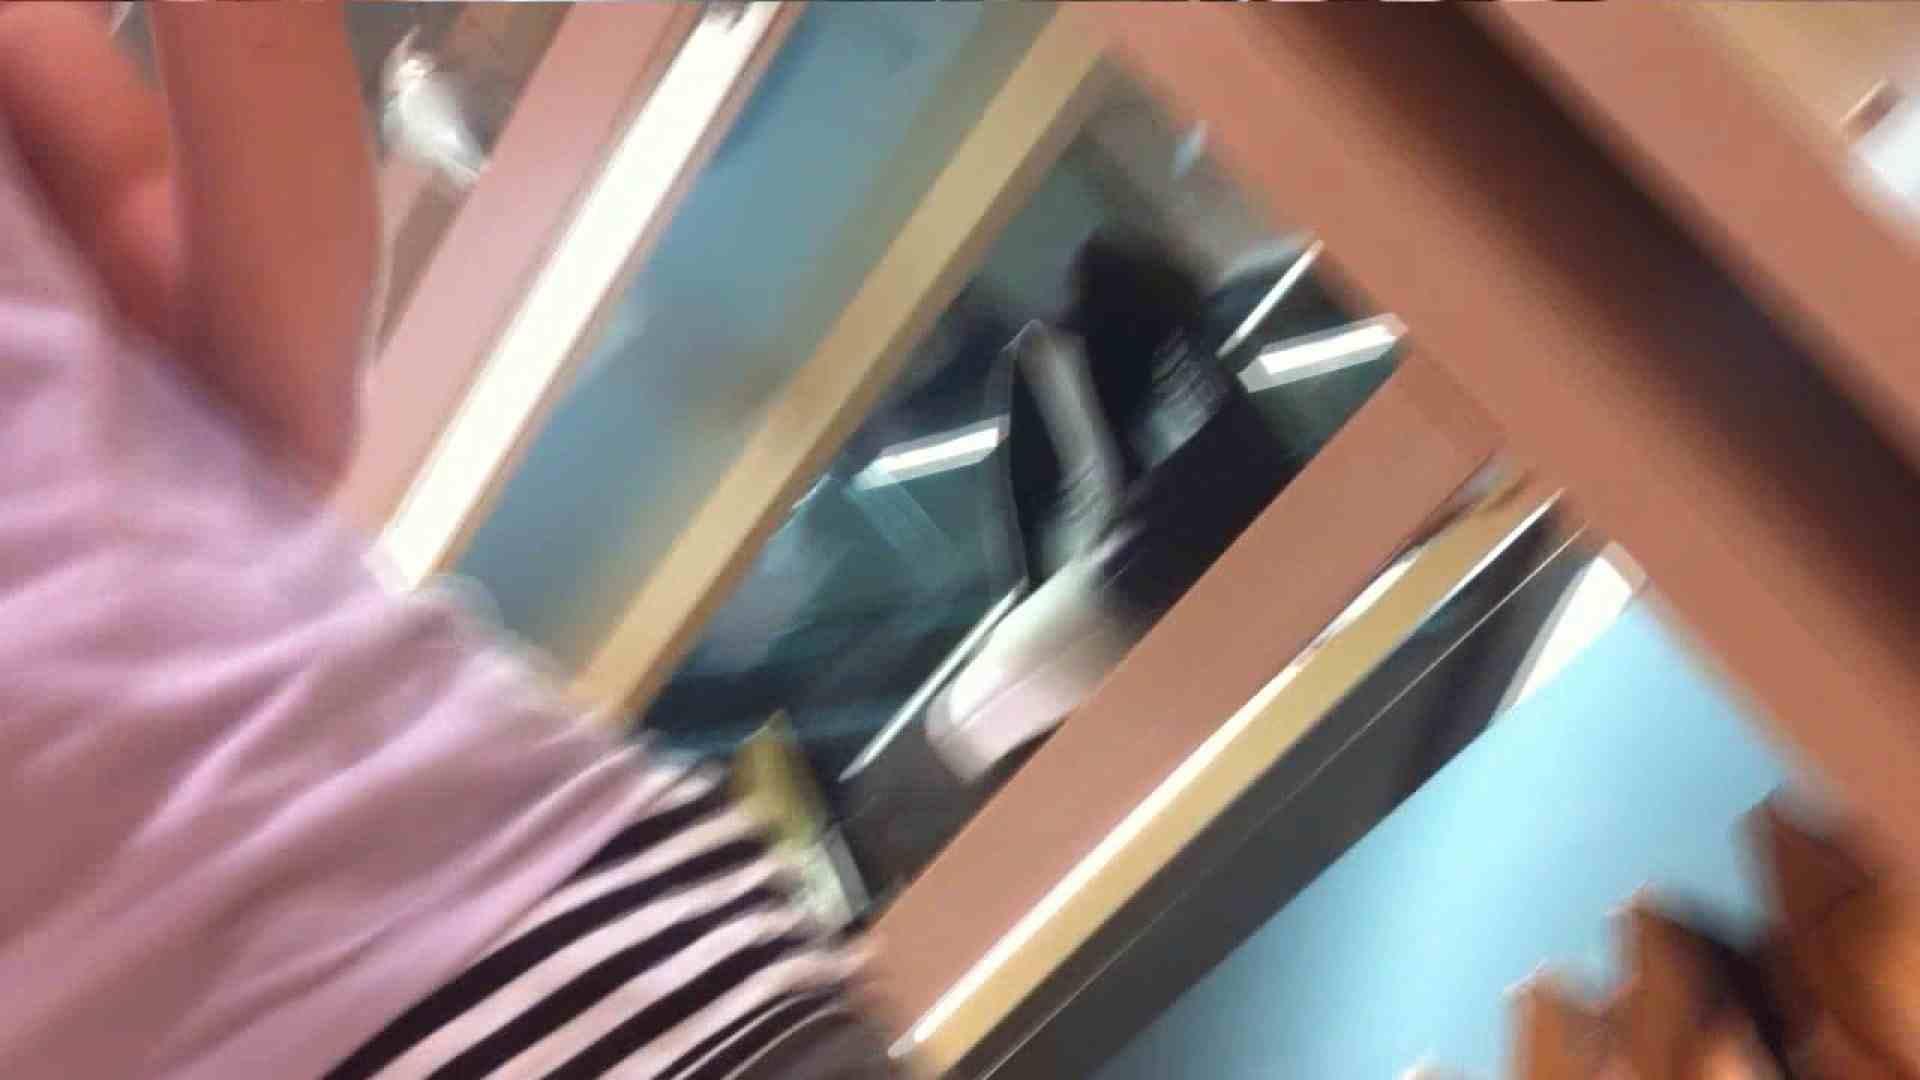 vol.34 美人アパレル胸チラ&パンチラ メガネ属性っていいよね♥ 新入生パンチラ ヌード画像 104pic 64